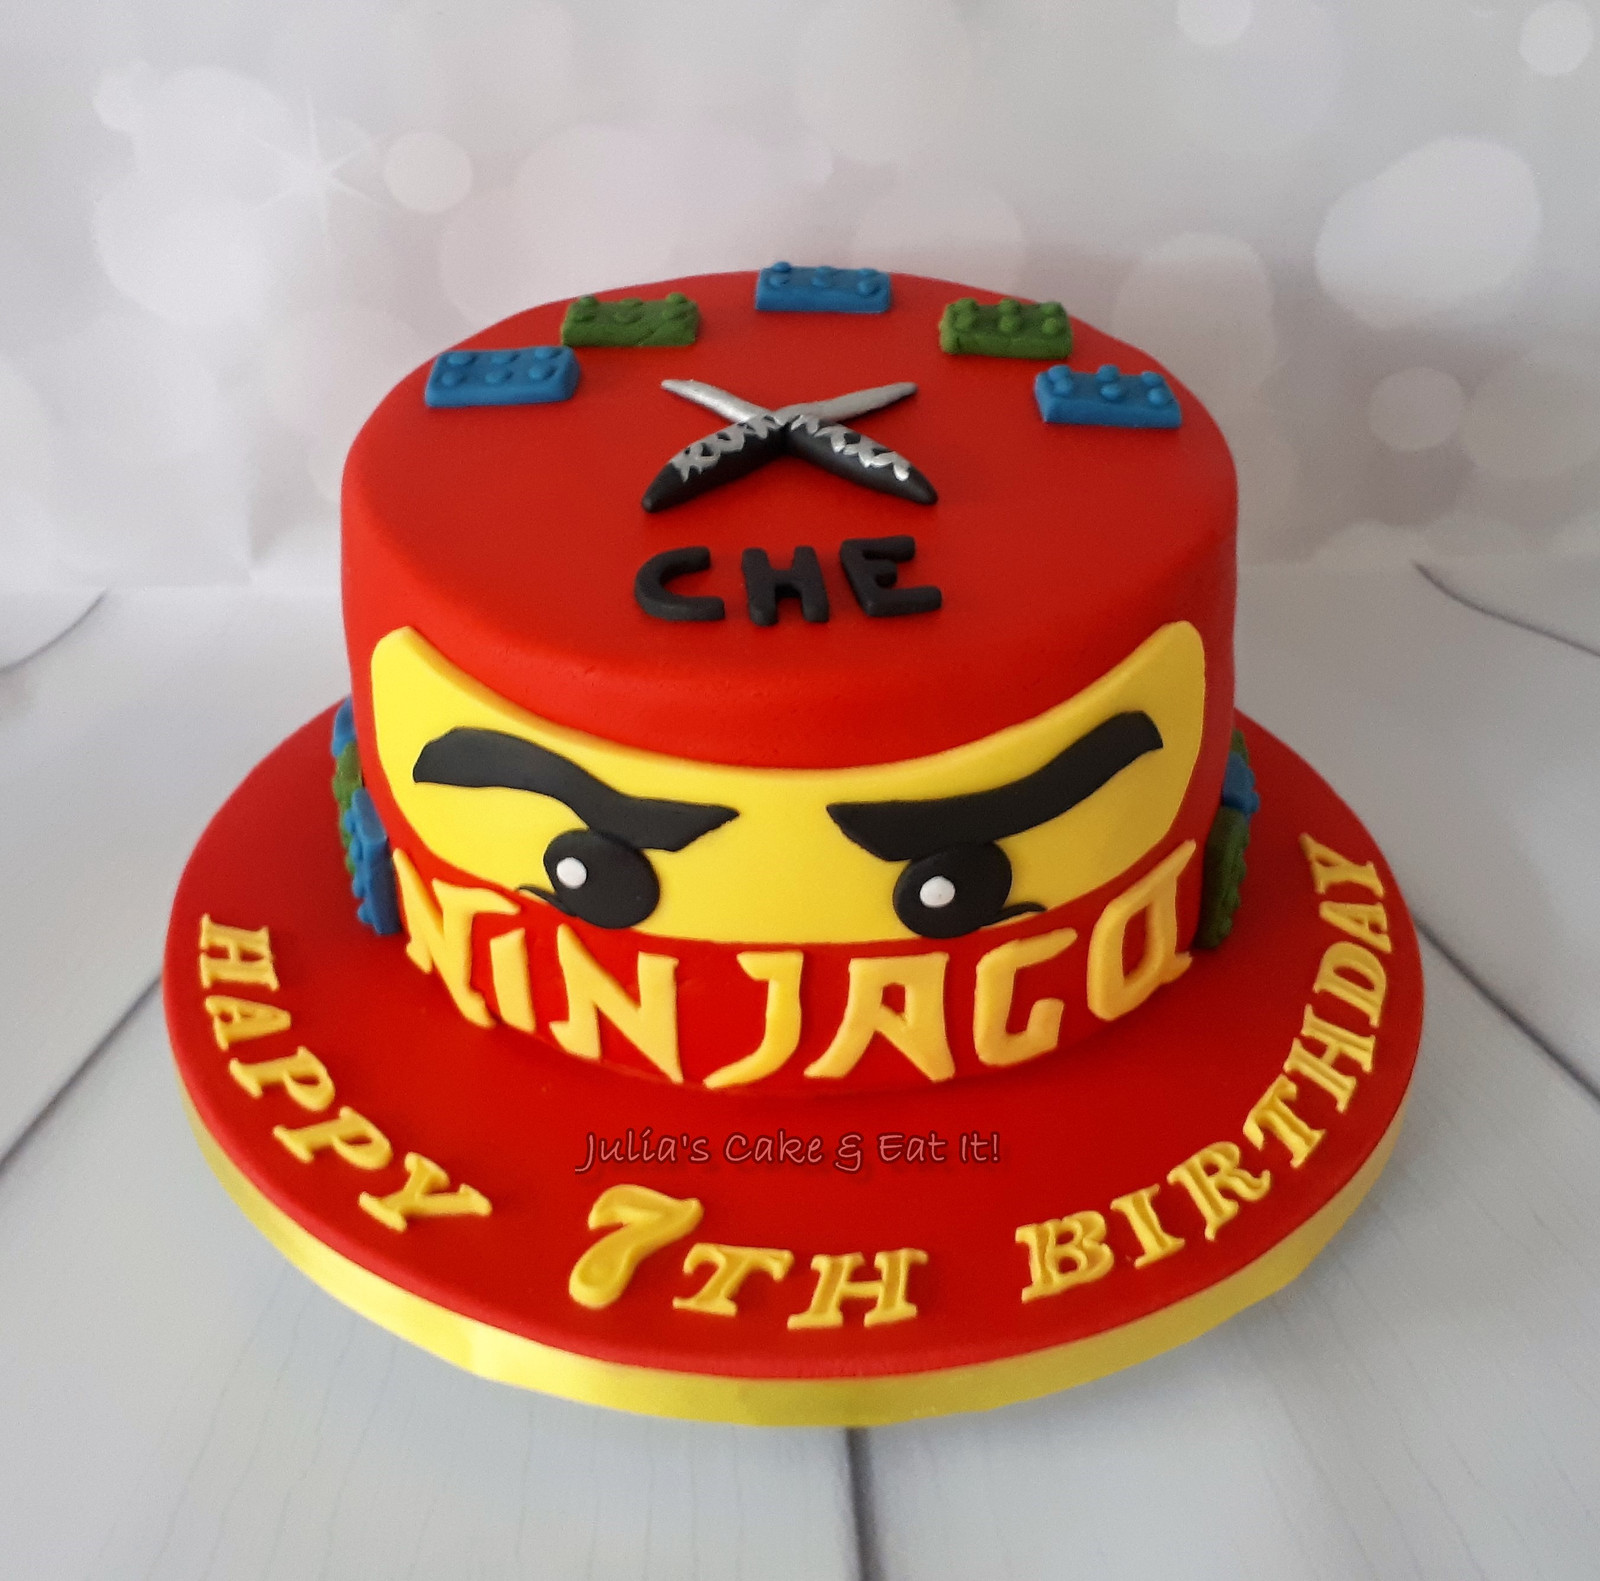 Birthday Cakes For Children England Julias Cake Eat It